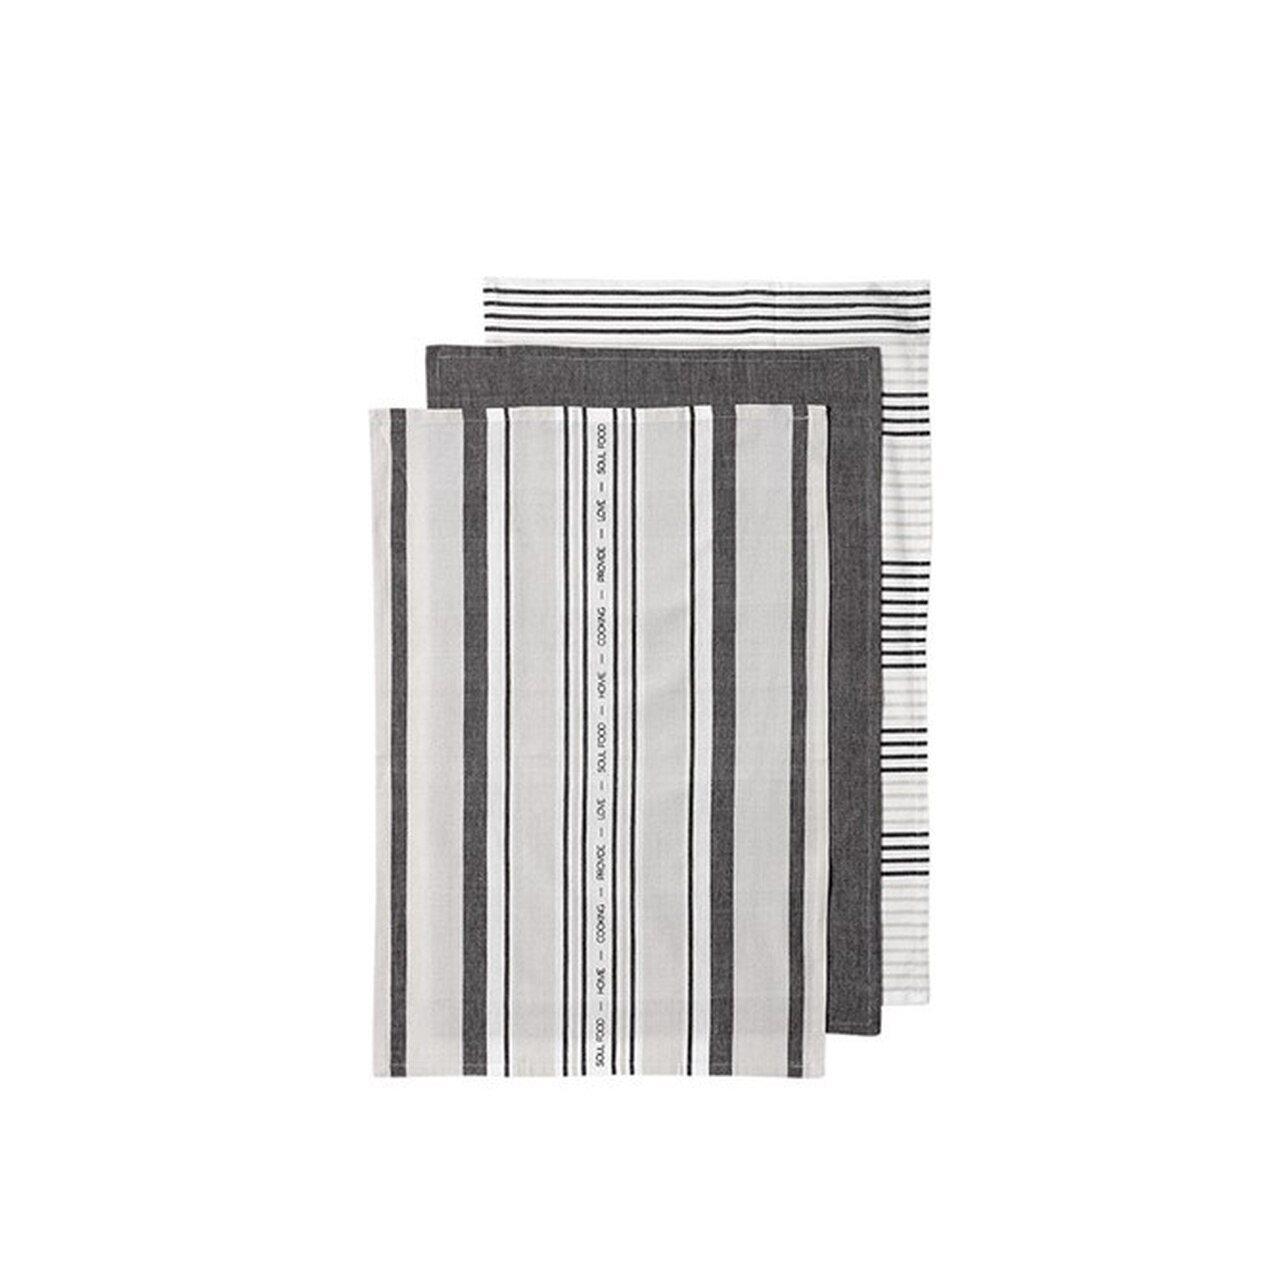 Ladelle Πετσέτες Κουζίνας Βαμβακερές Γκρι Abode Stripe 45X70cm- Σετ 3 Τεμάχια